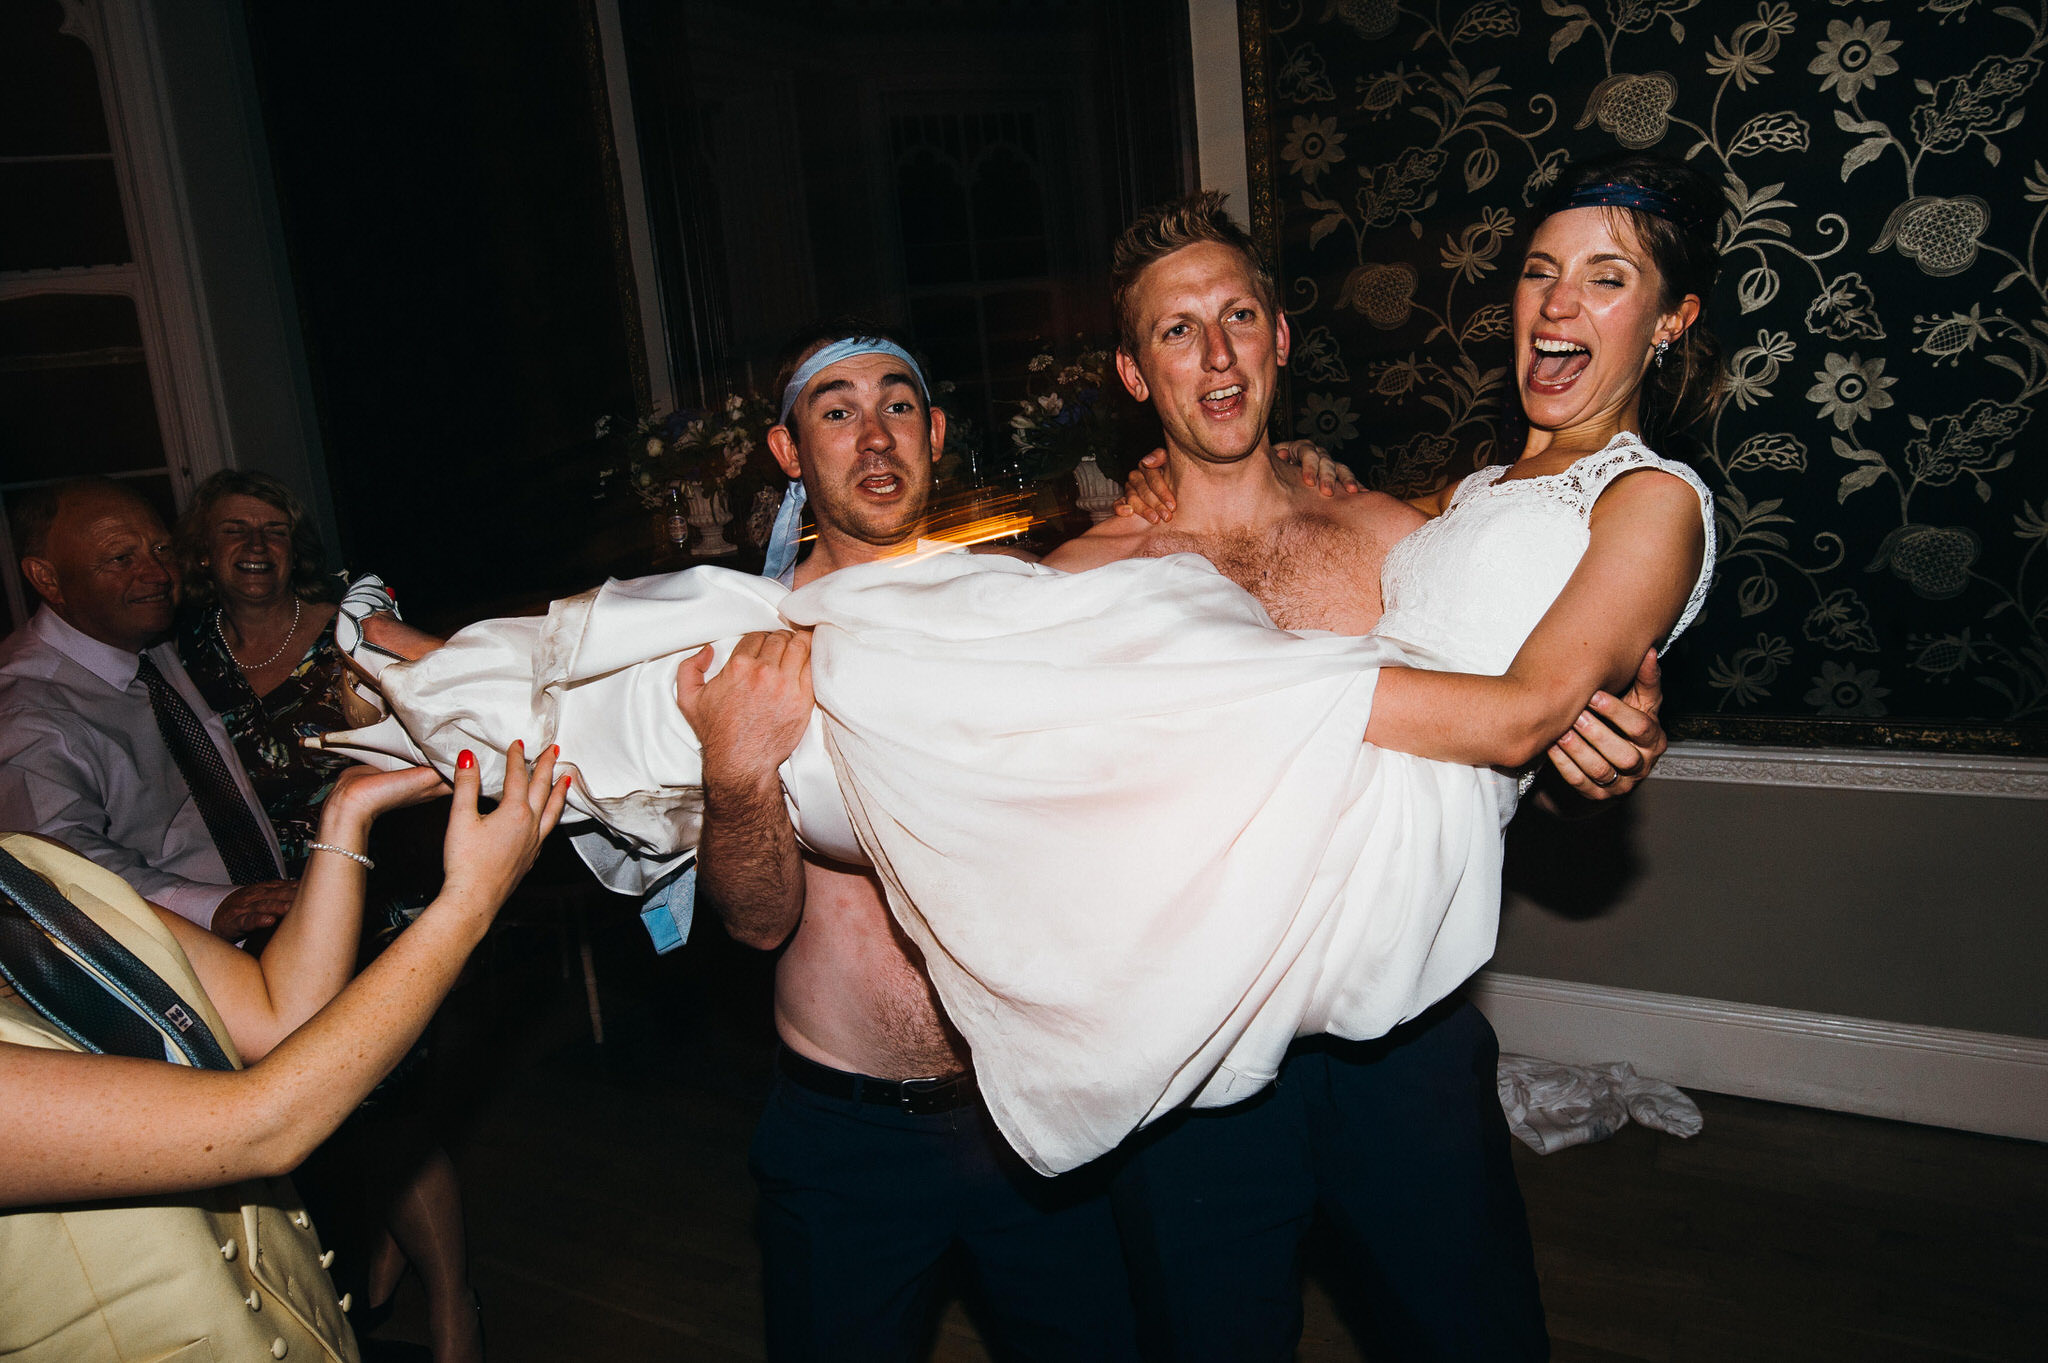 Fun at wedding party